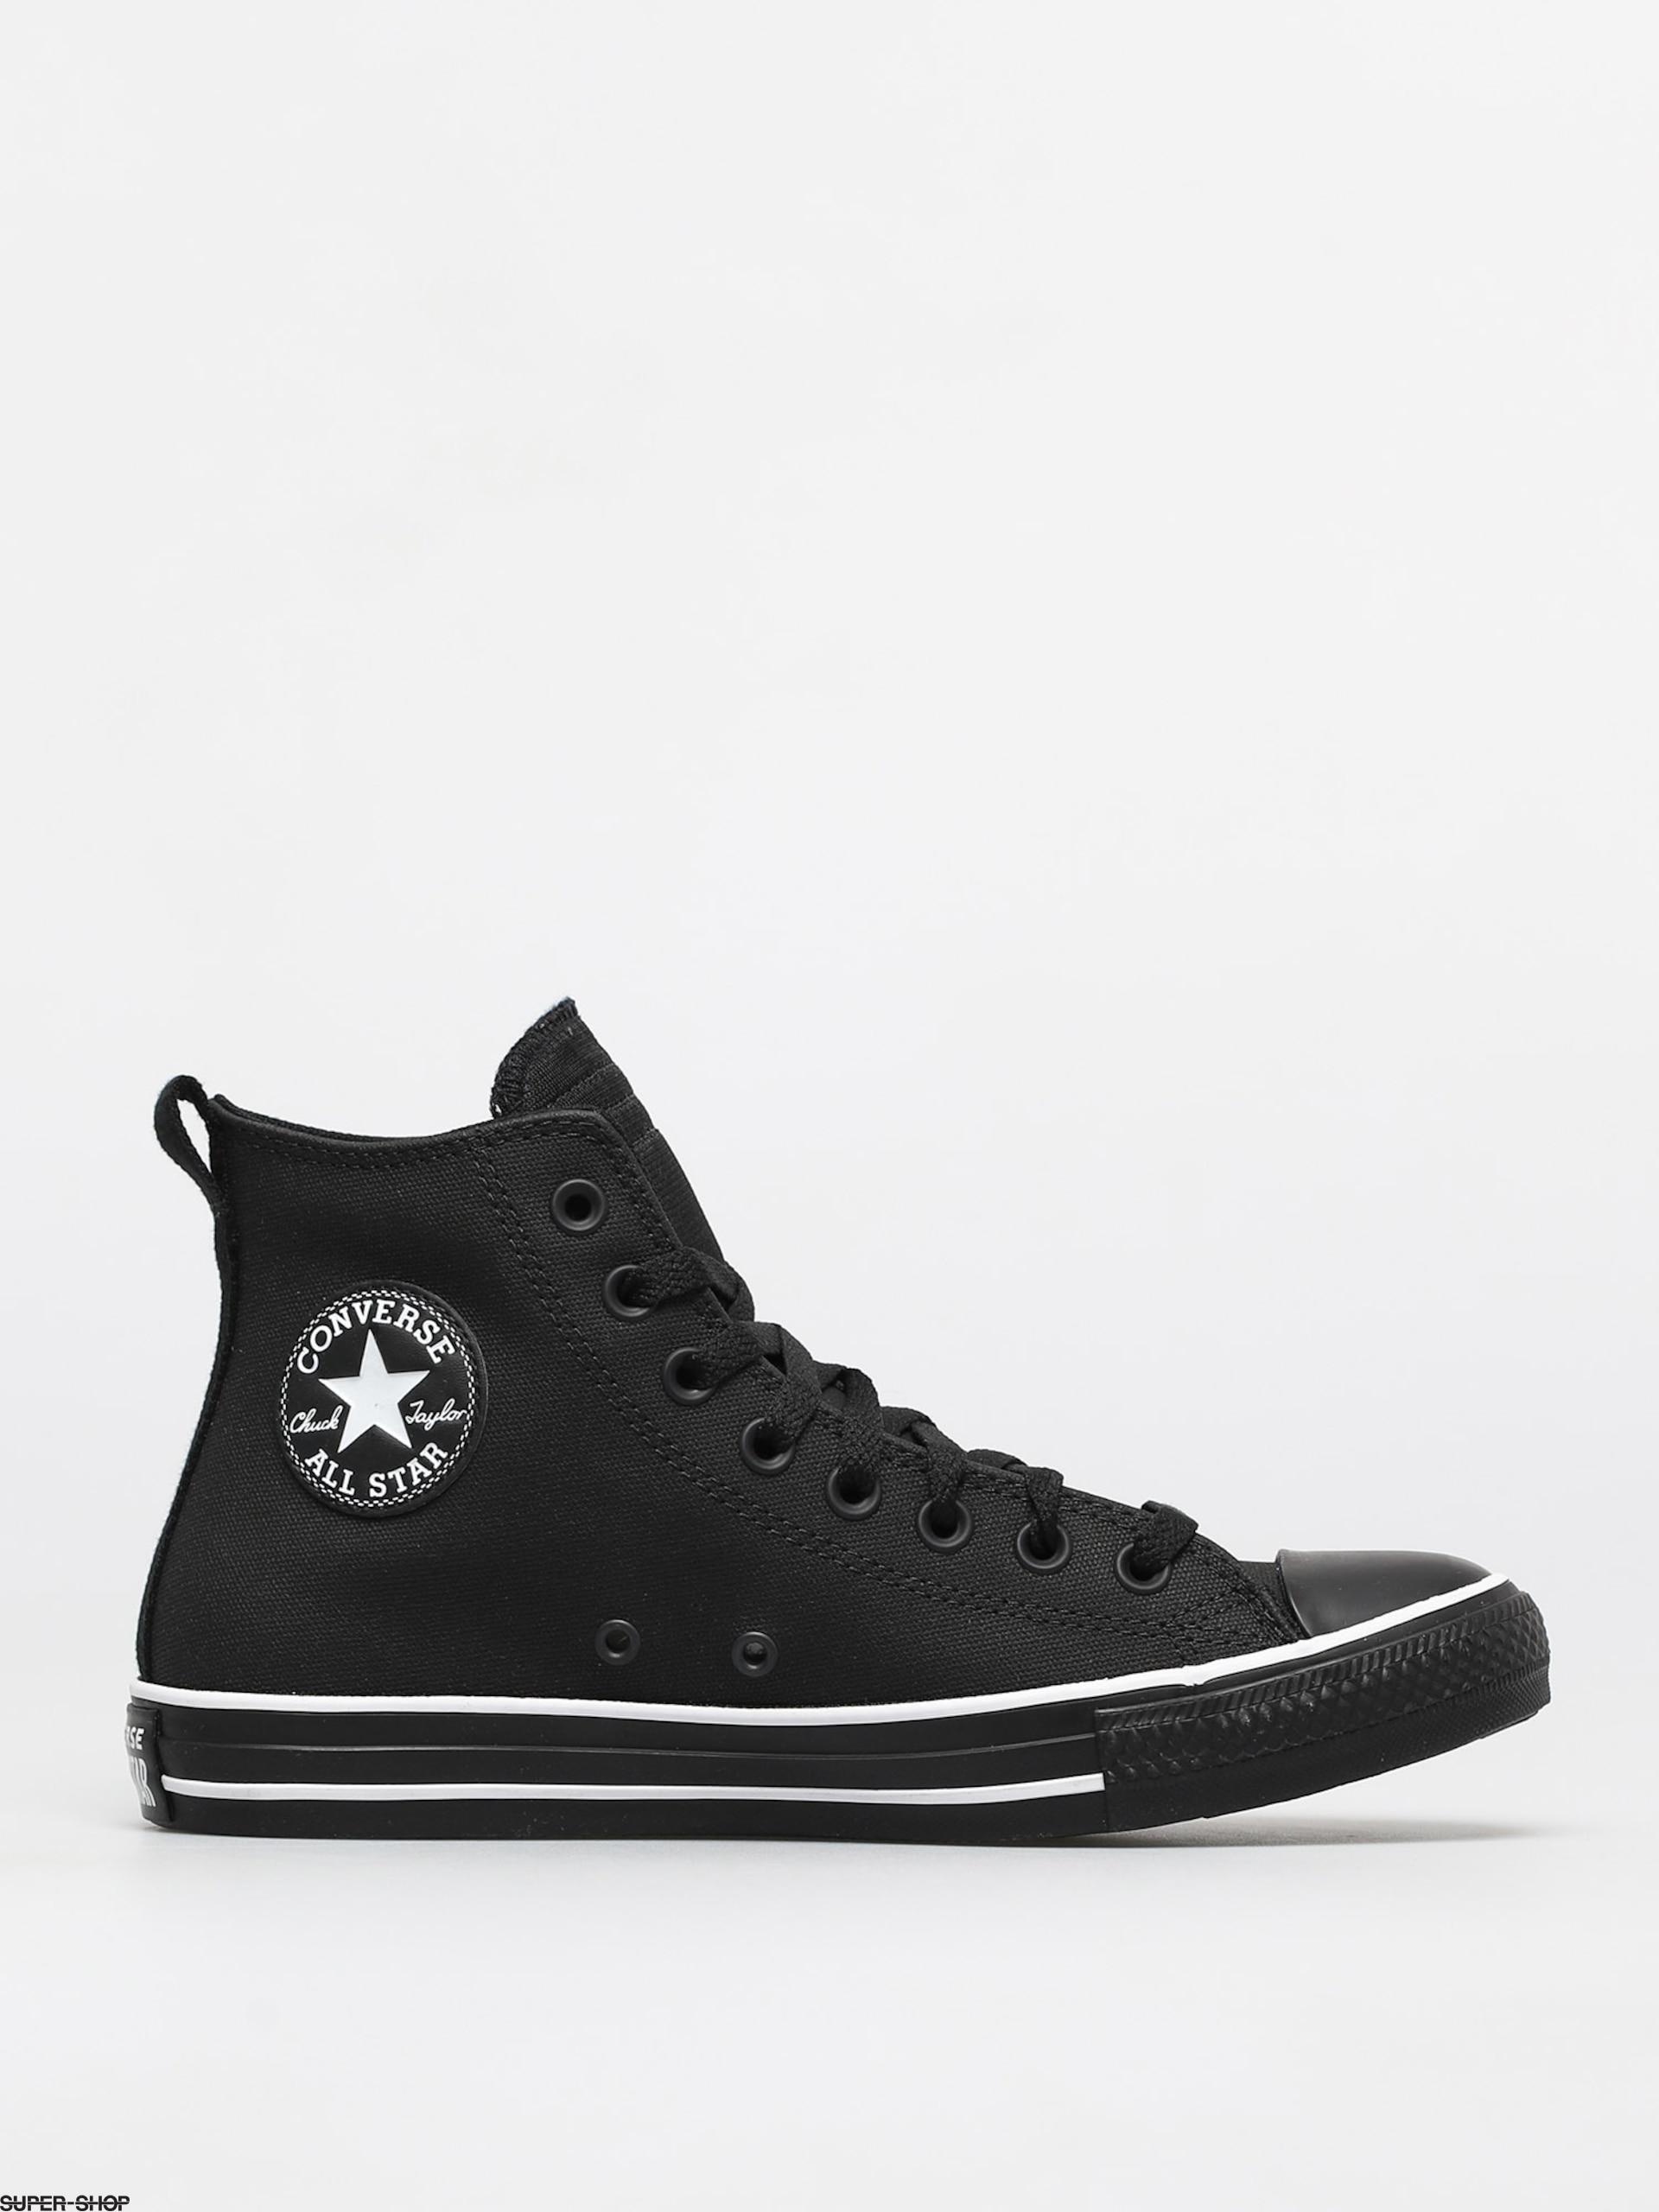 Converse Chuck Taylor All Star Padded Tongue Leather Chucks (black/black/white)